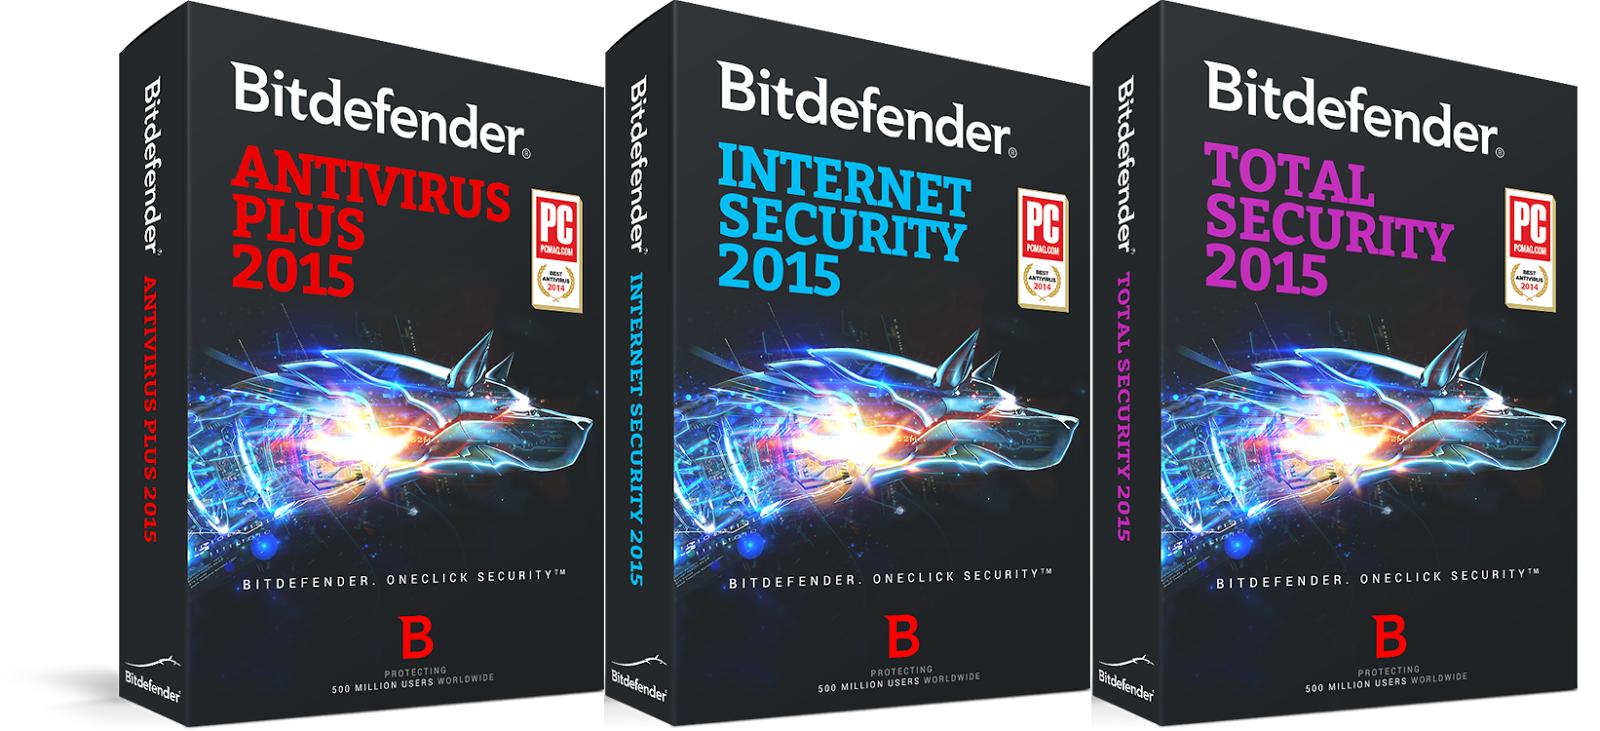 bitdefender_total_security_2015